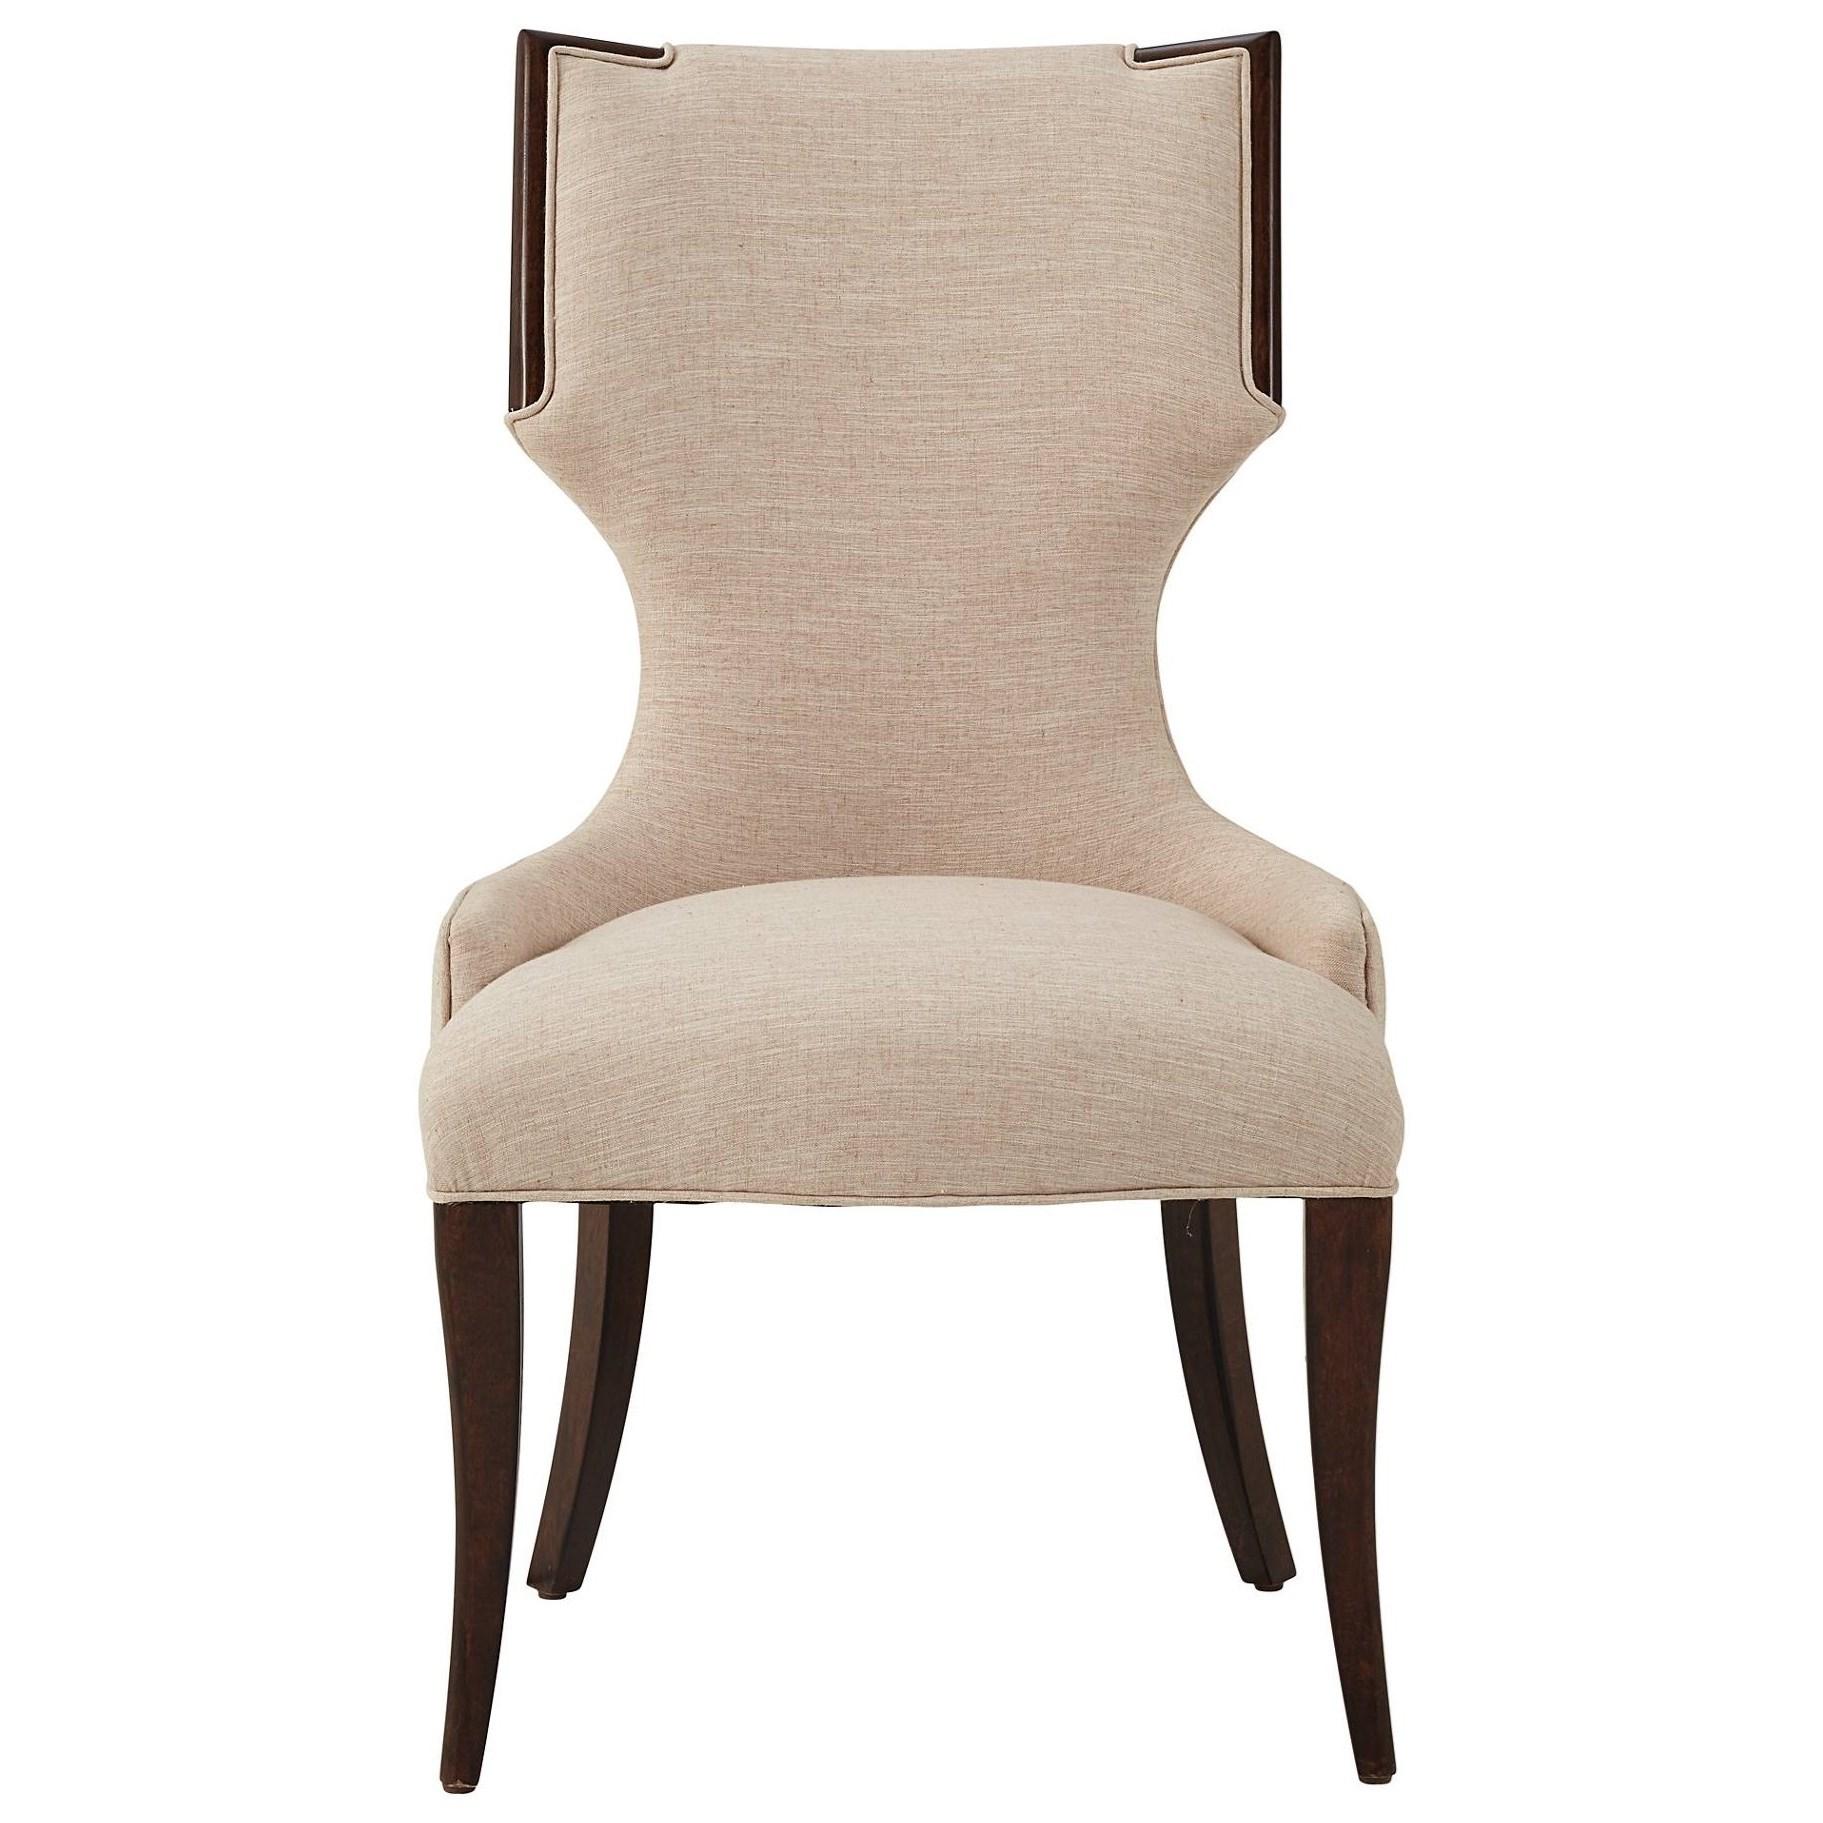 Stanley Furniture Virage Host Chair - Item Number: 696-11-75